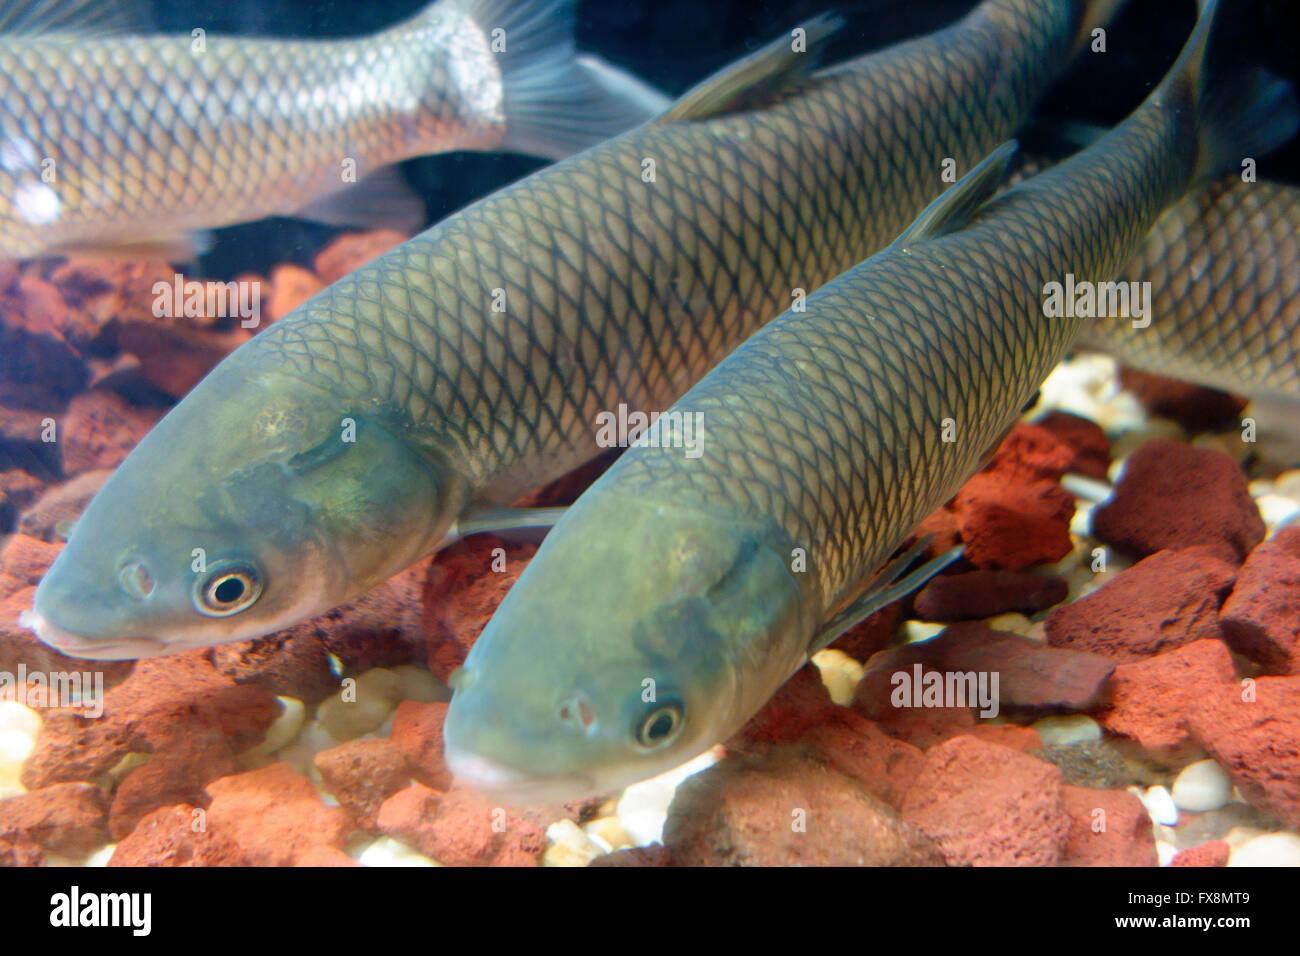 Exotic invasive grass carp fish in florida usa stock for Invasive fish in florida